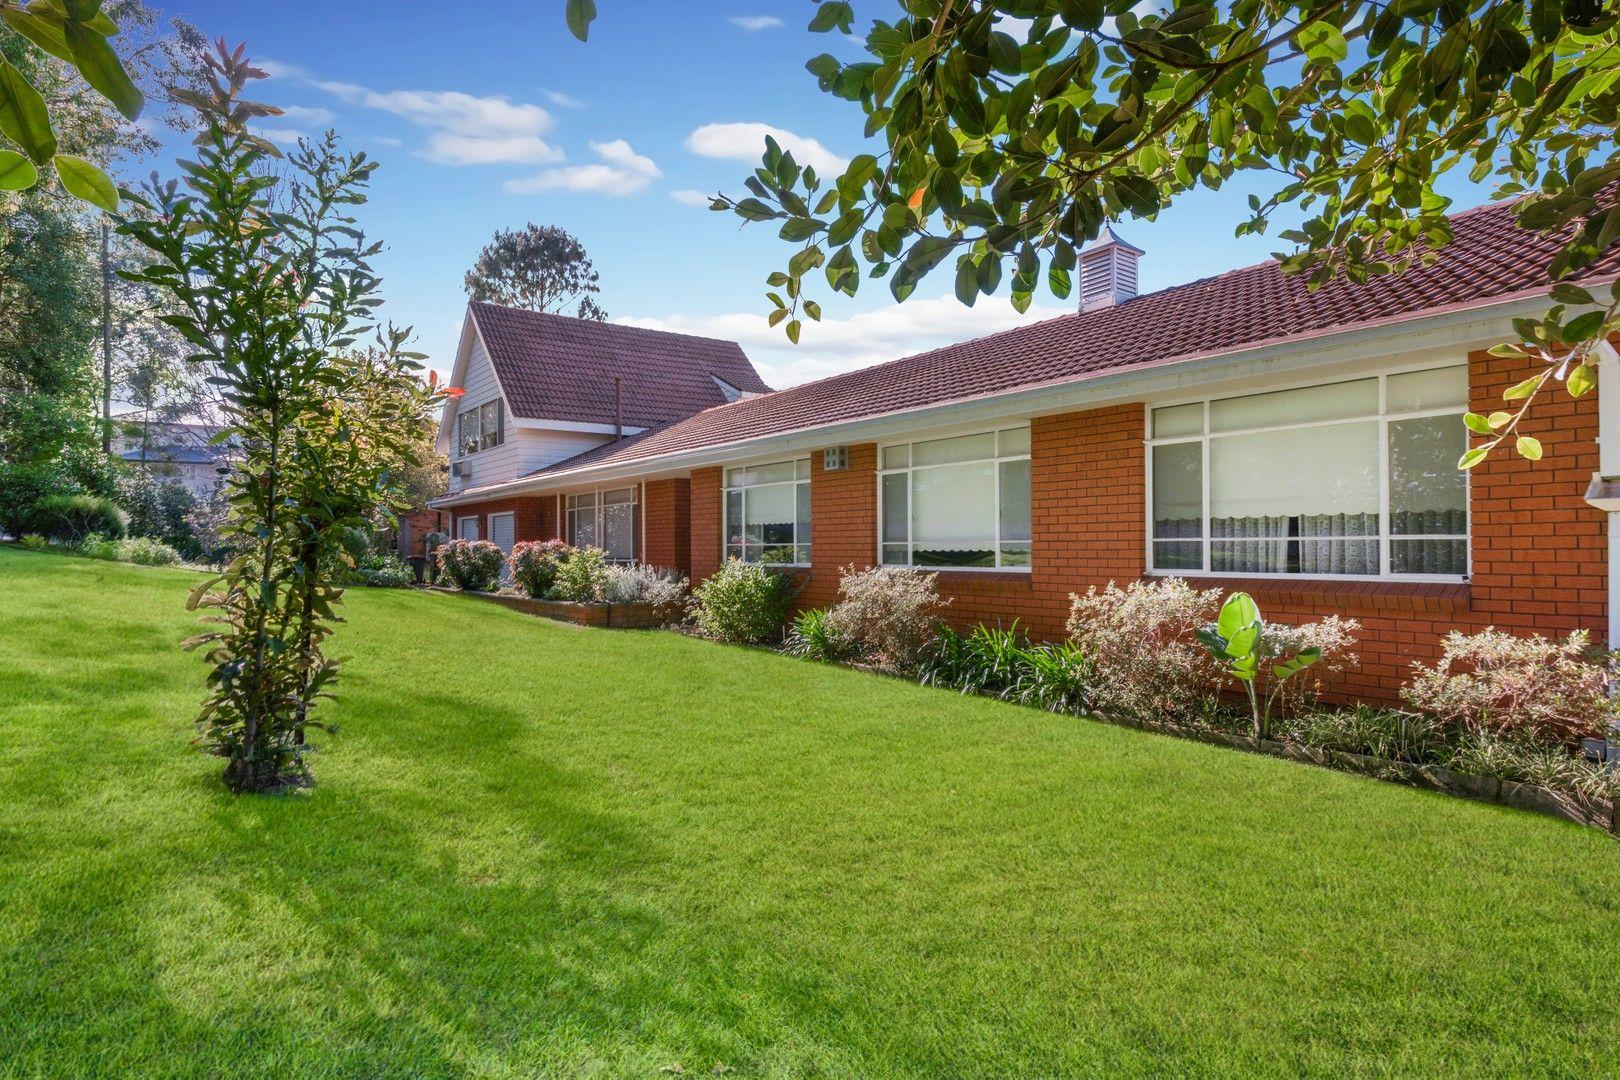 18-20 Blacks Road, West Pennant Hills NSW 2125, Image 0